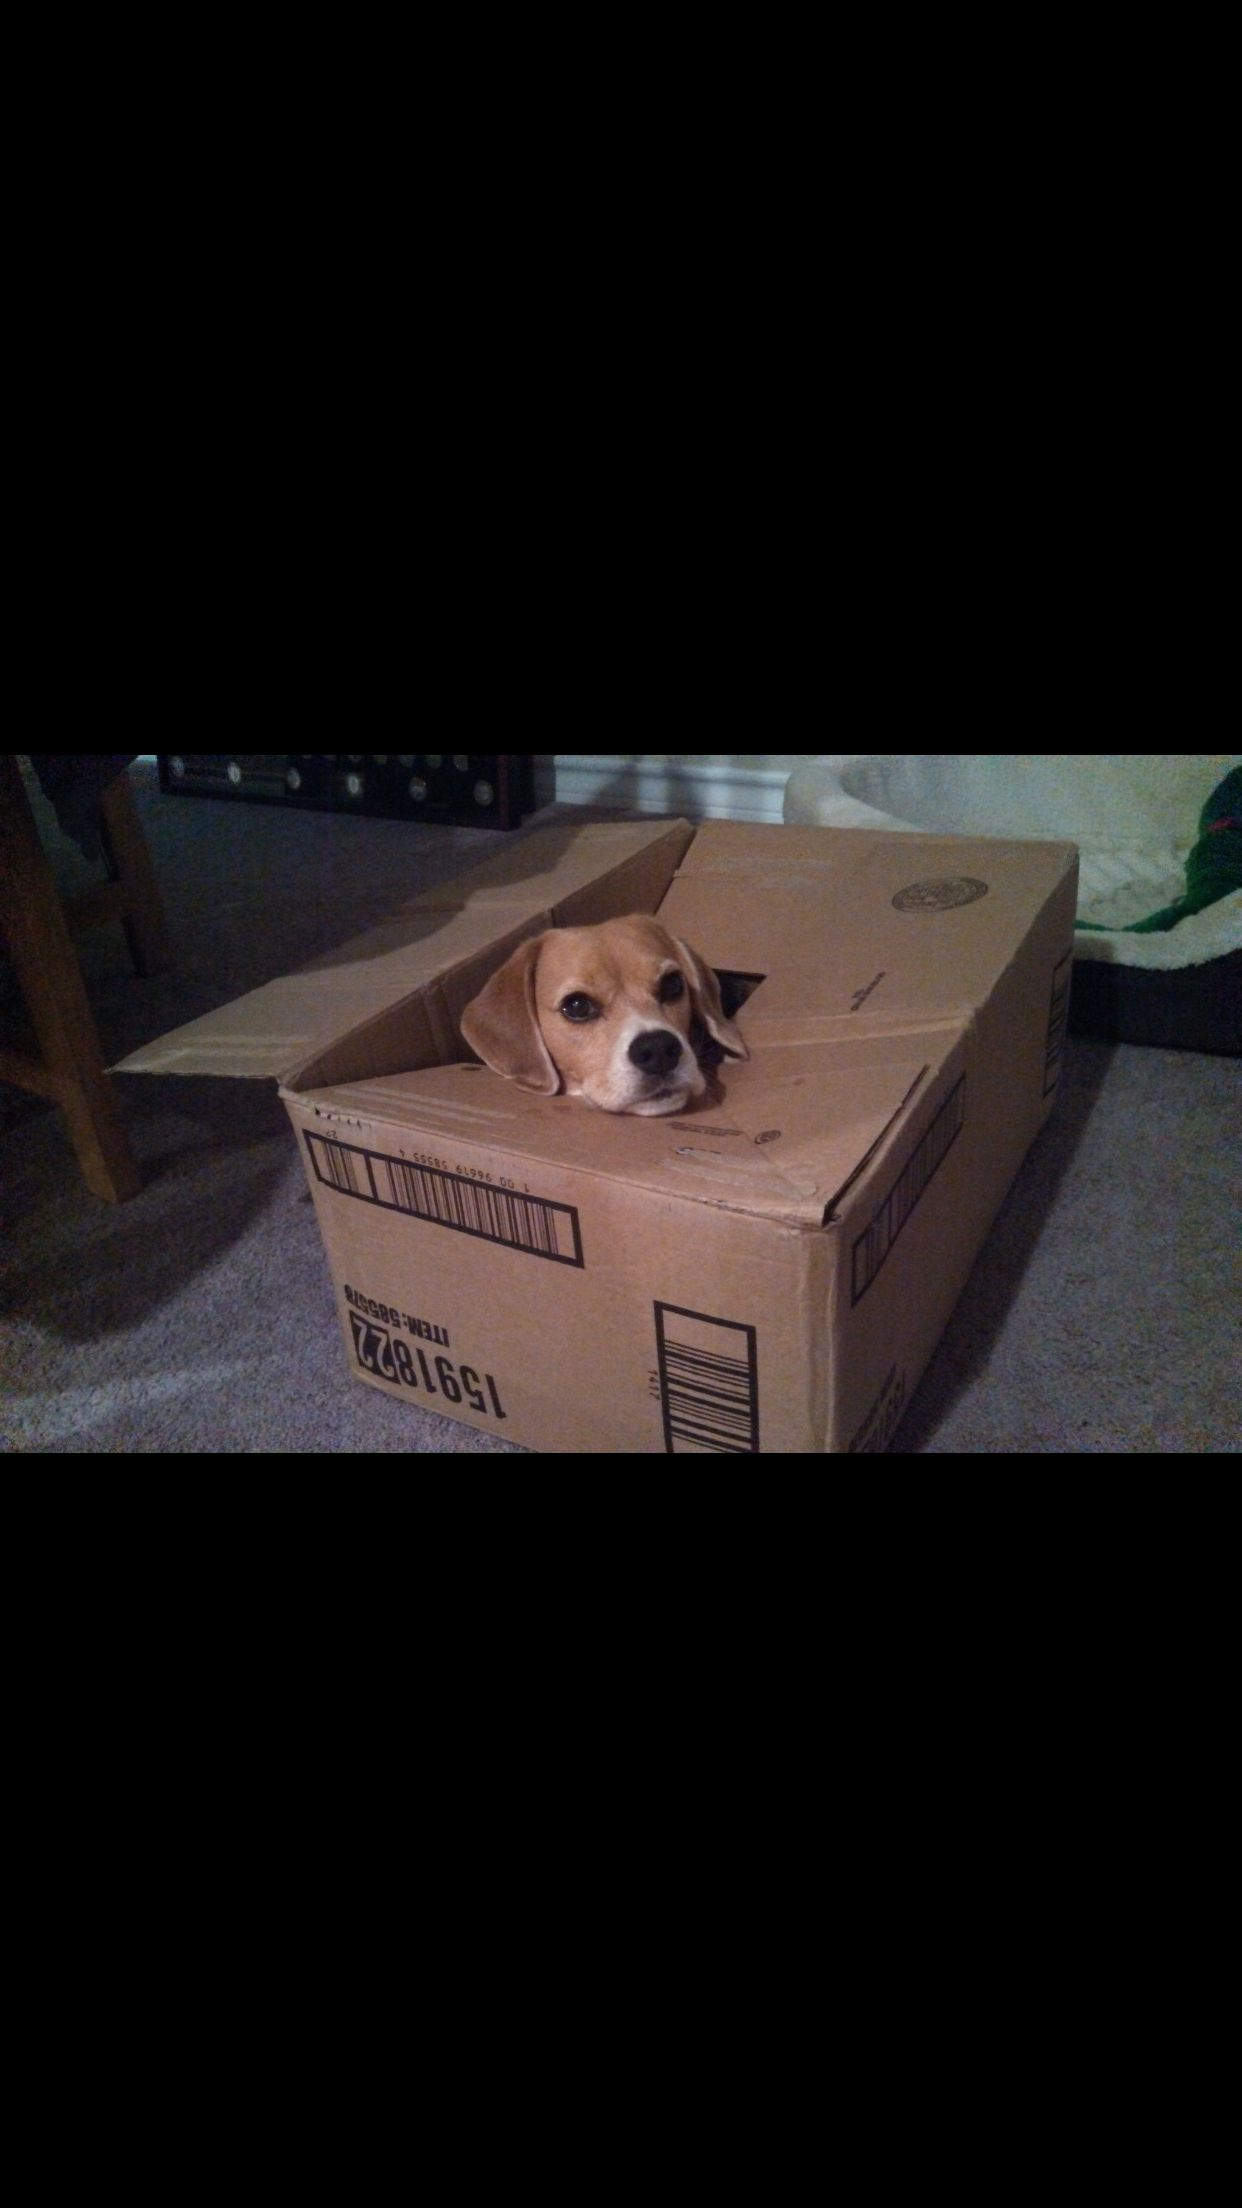 beagle friendly and curious beagle pinterest beagle box and dog